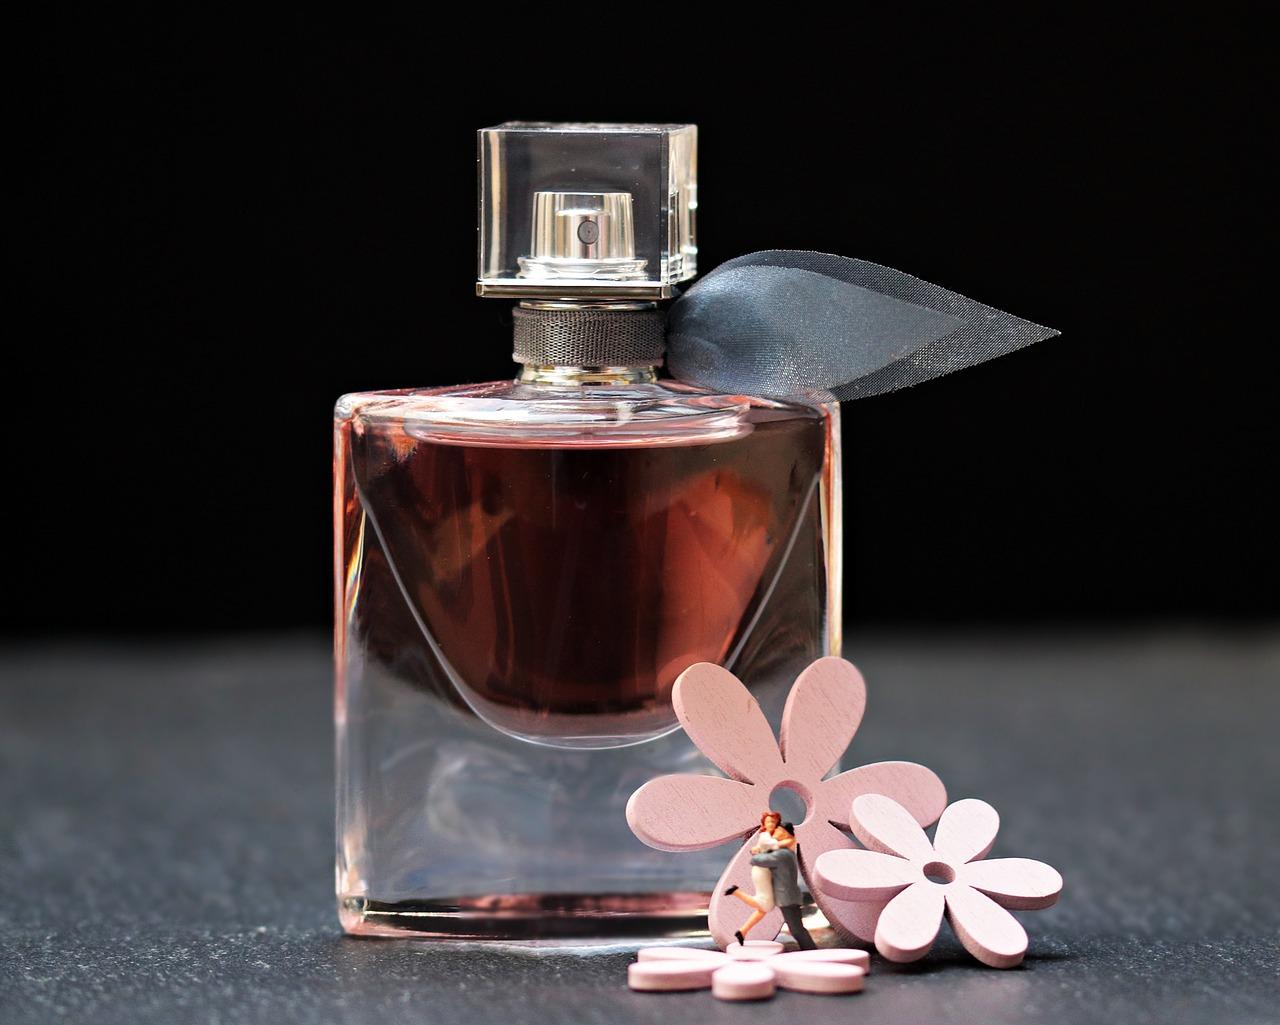 perfume-2142824_1280